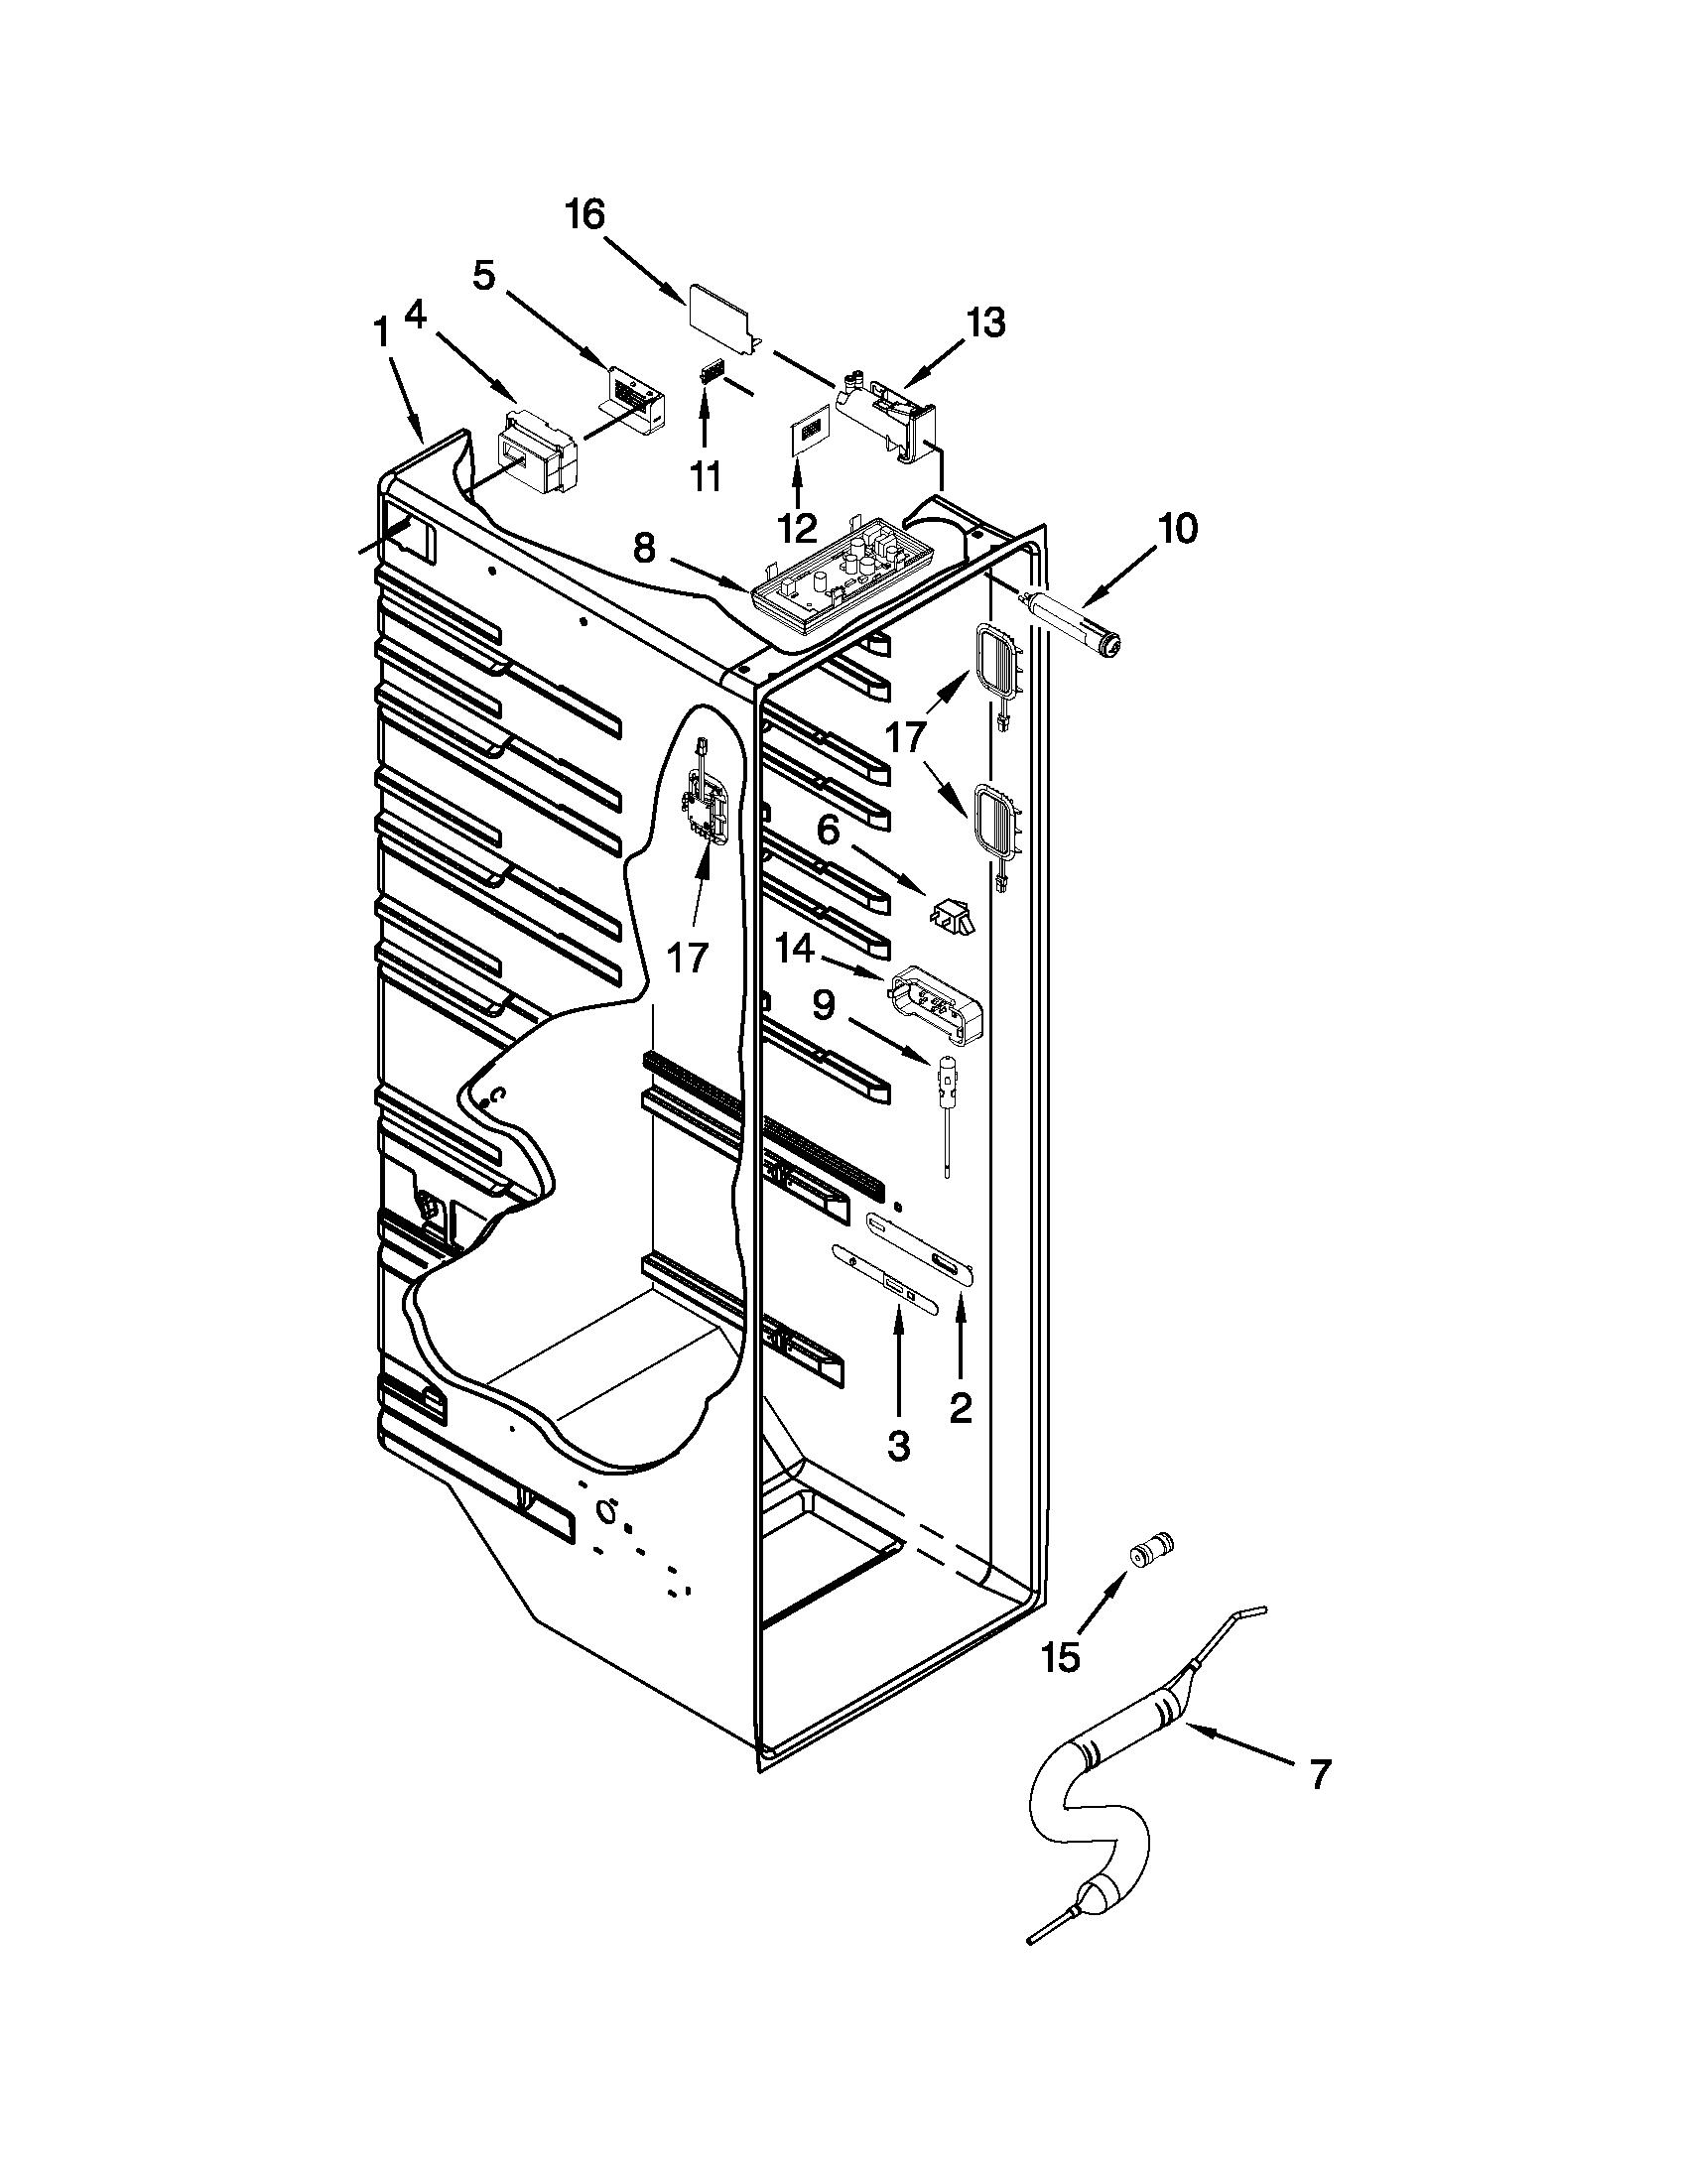 KENMORE REFRIGERATOR MANUAL - Auto Electrical Wiring Diagram